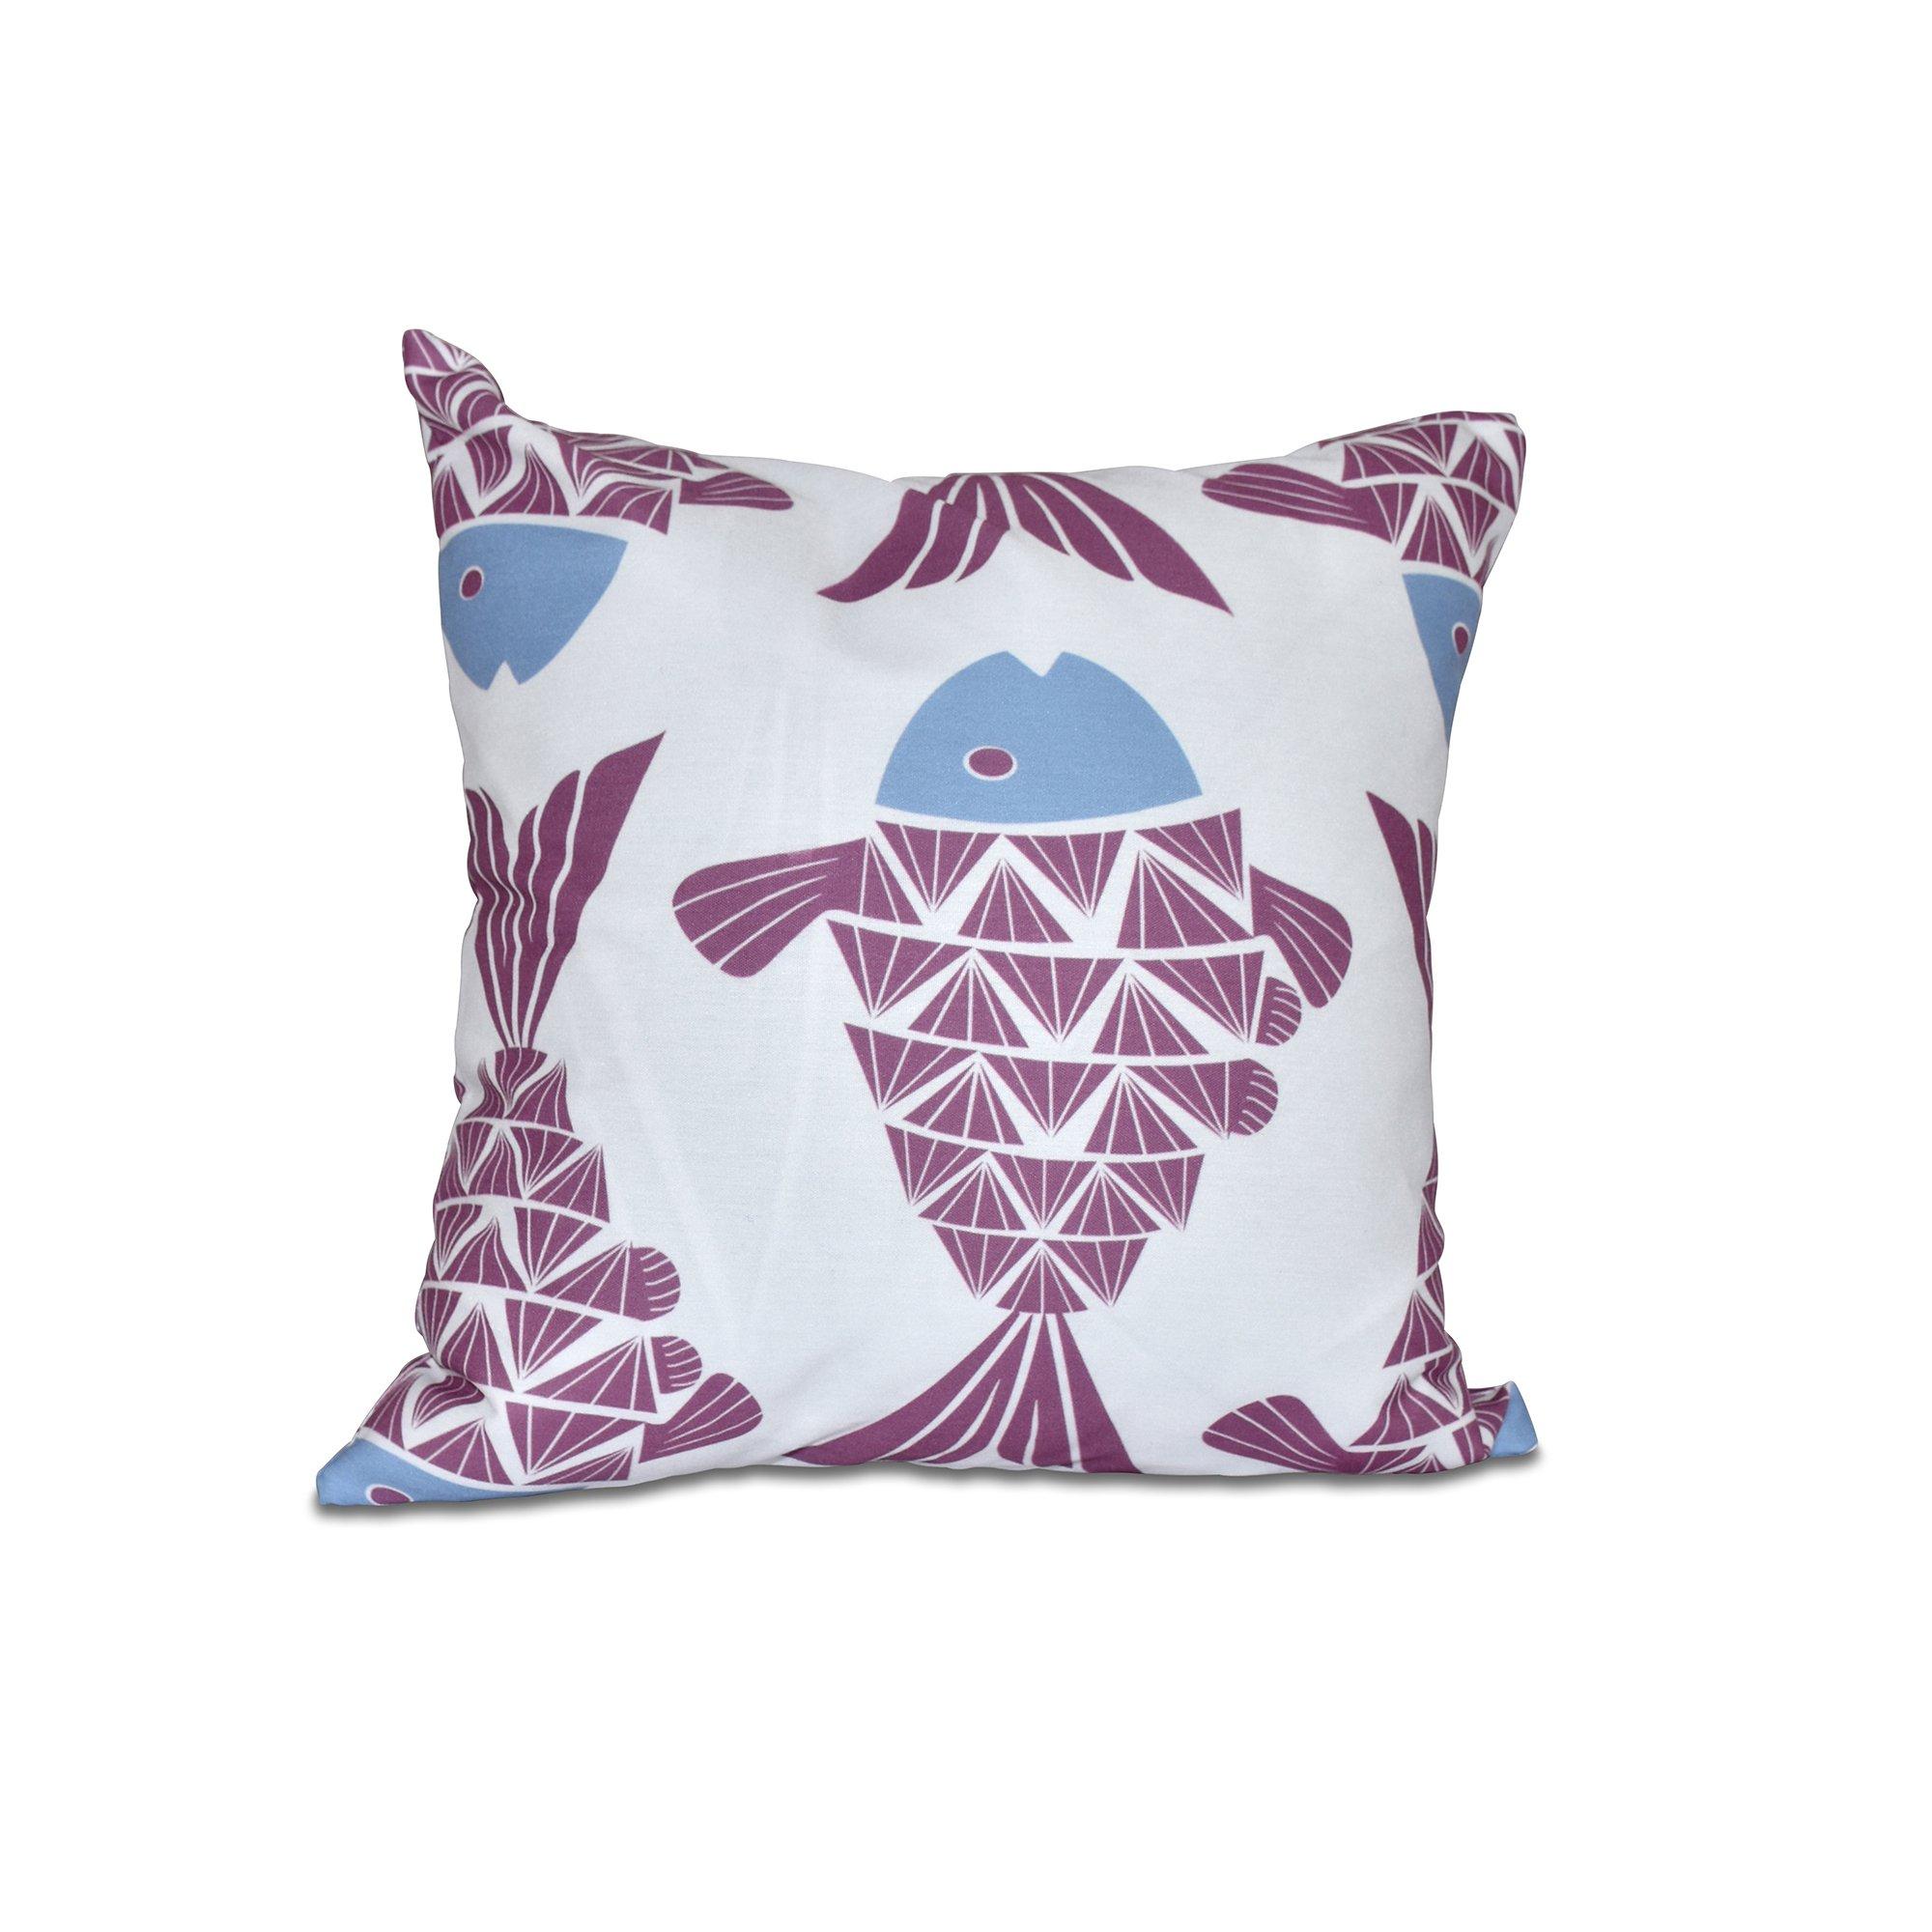 E by design O5PAN427PU5BL16-16 16 x 16 Big Fish Animal Print Purple Outdoor Pillow